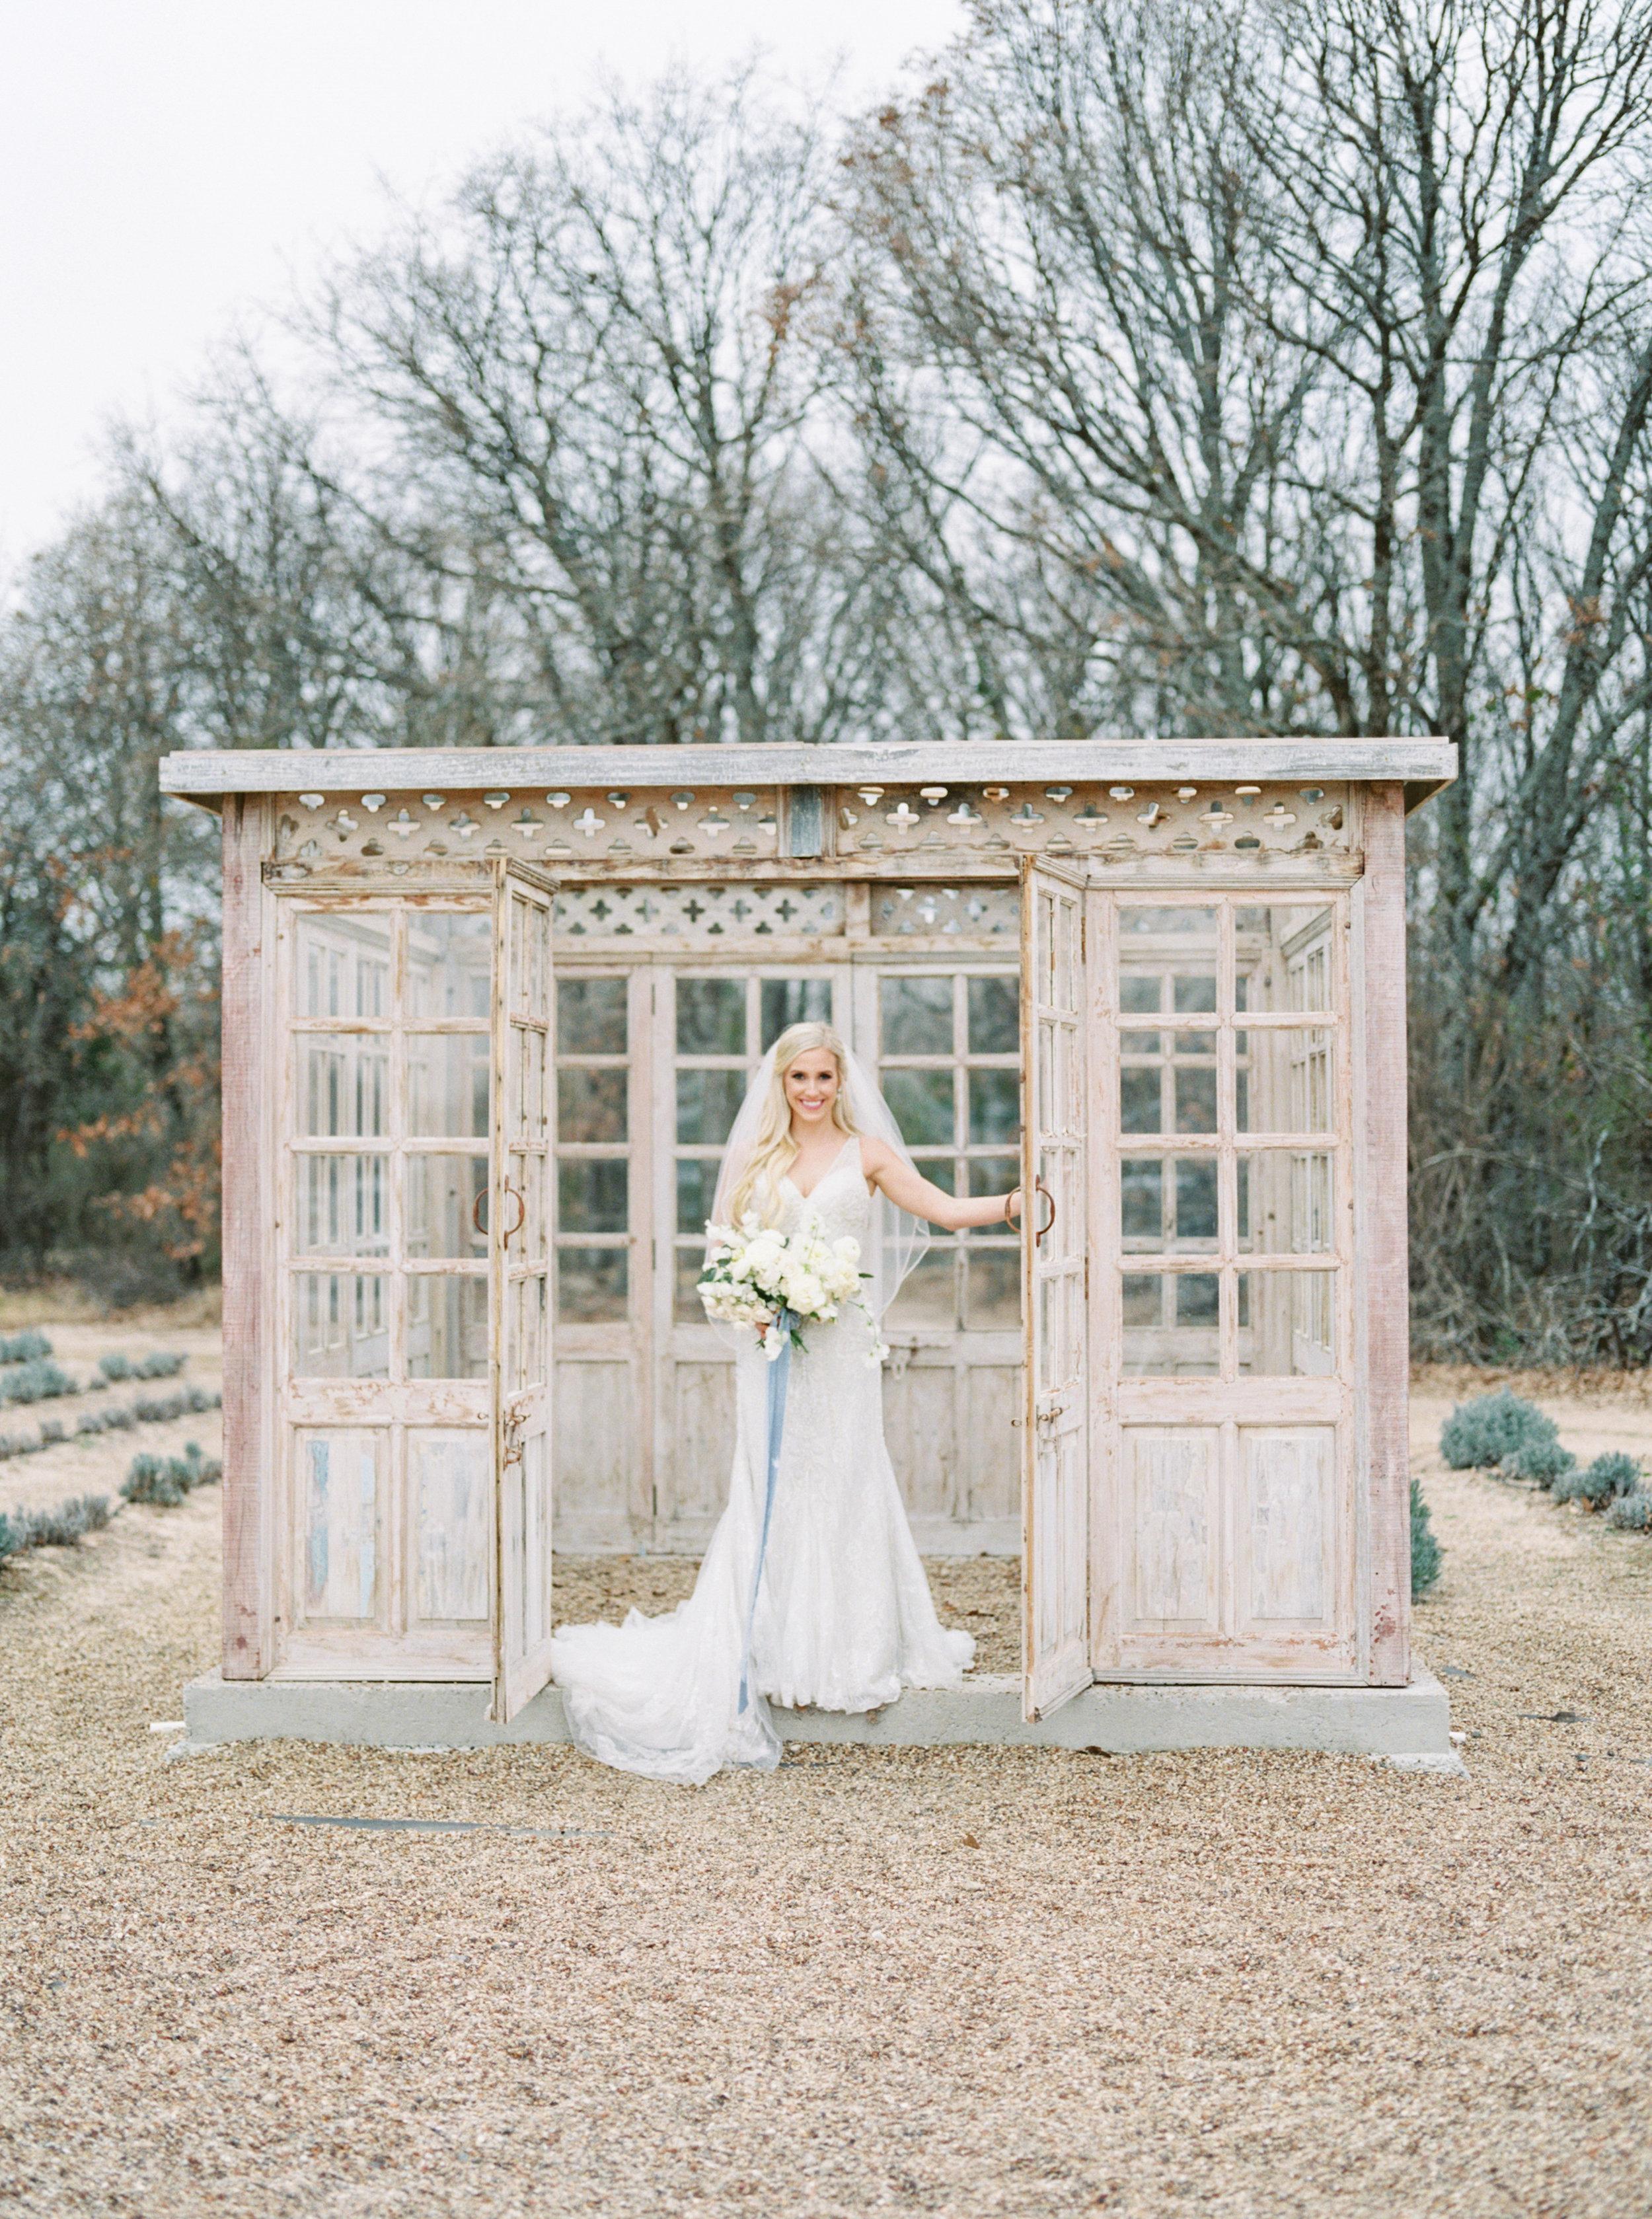 Chloe+Austin Wedding_687.JPG